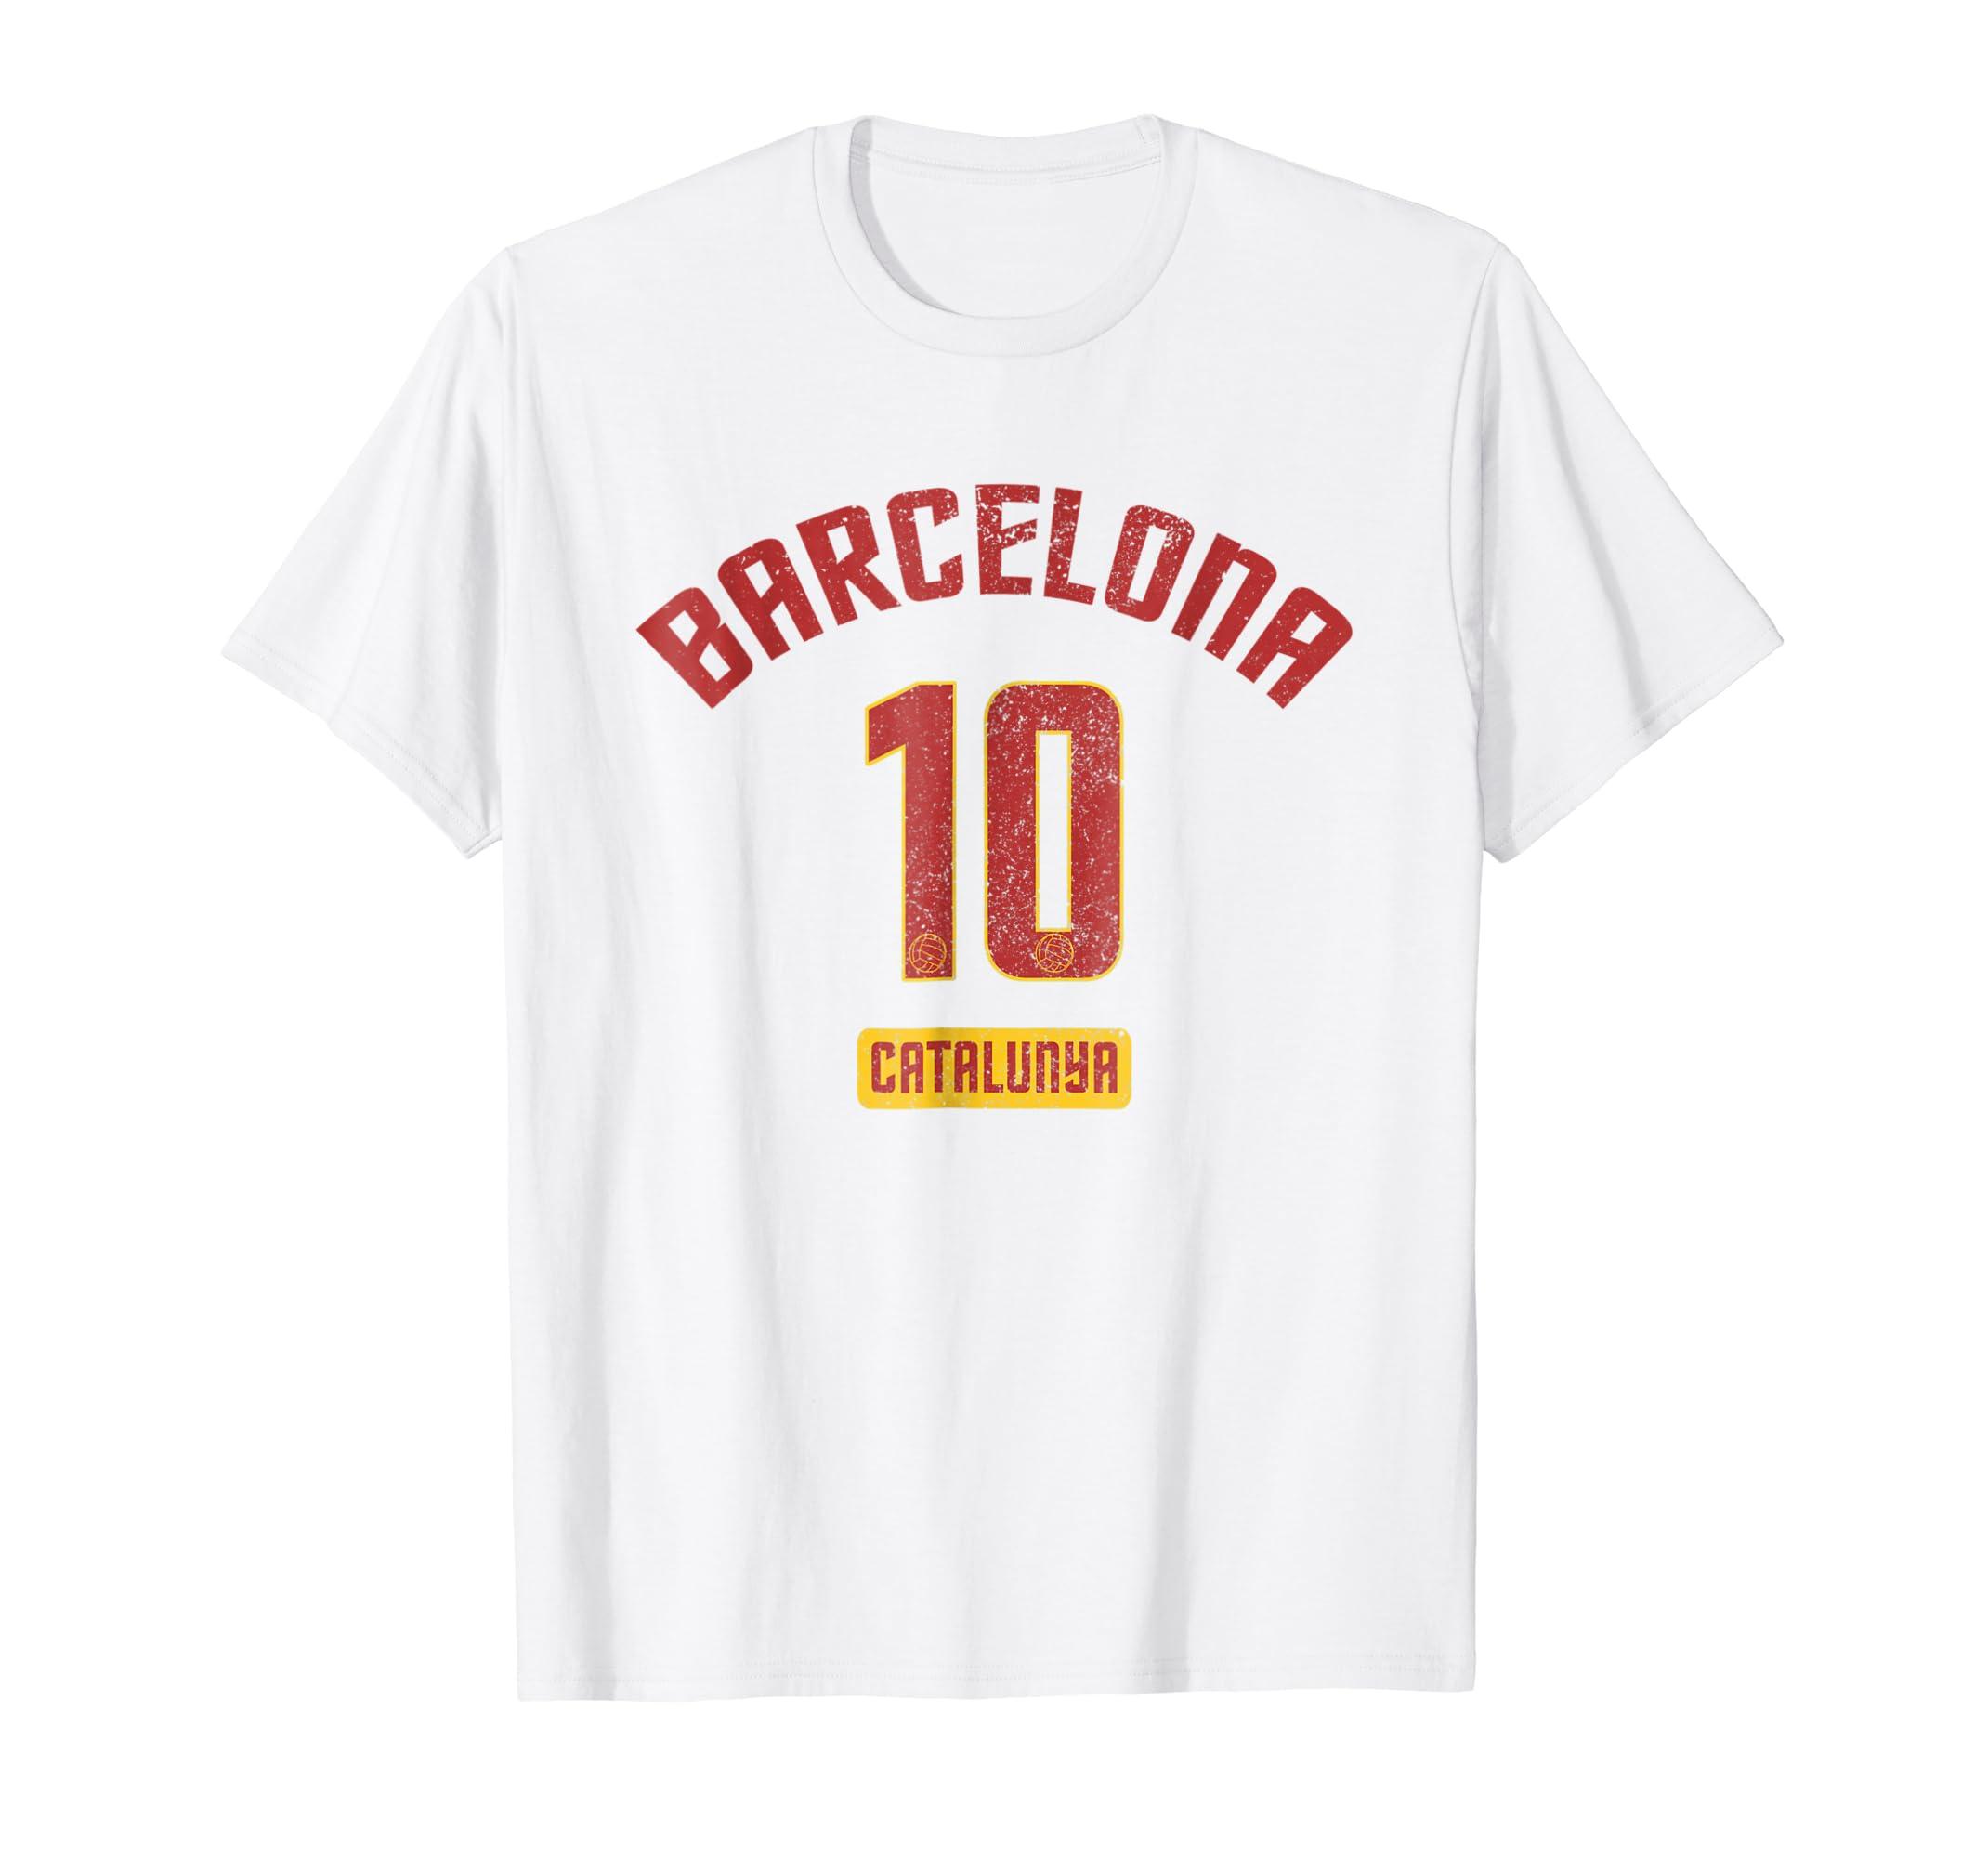 a77e311ebbaba1 Amazon.com  Barcelona Fan T-Shirt Forca Barca Fan Tee Shirt  Clothing